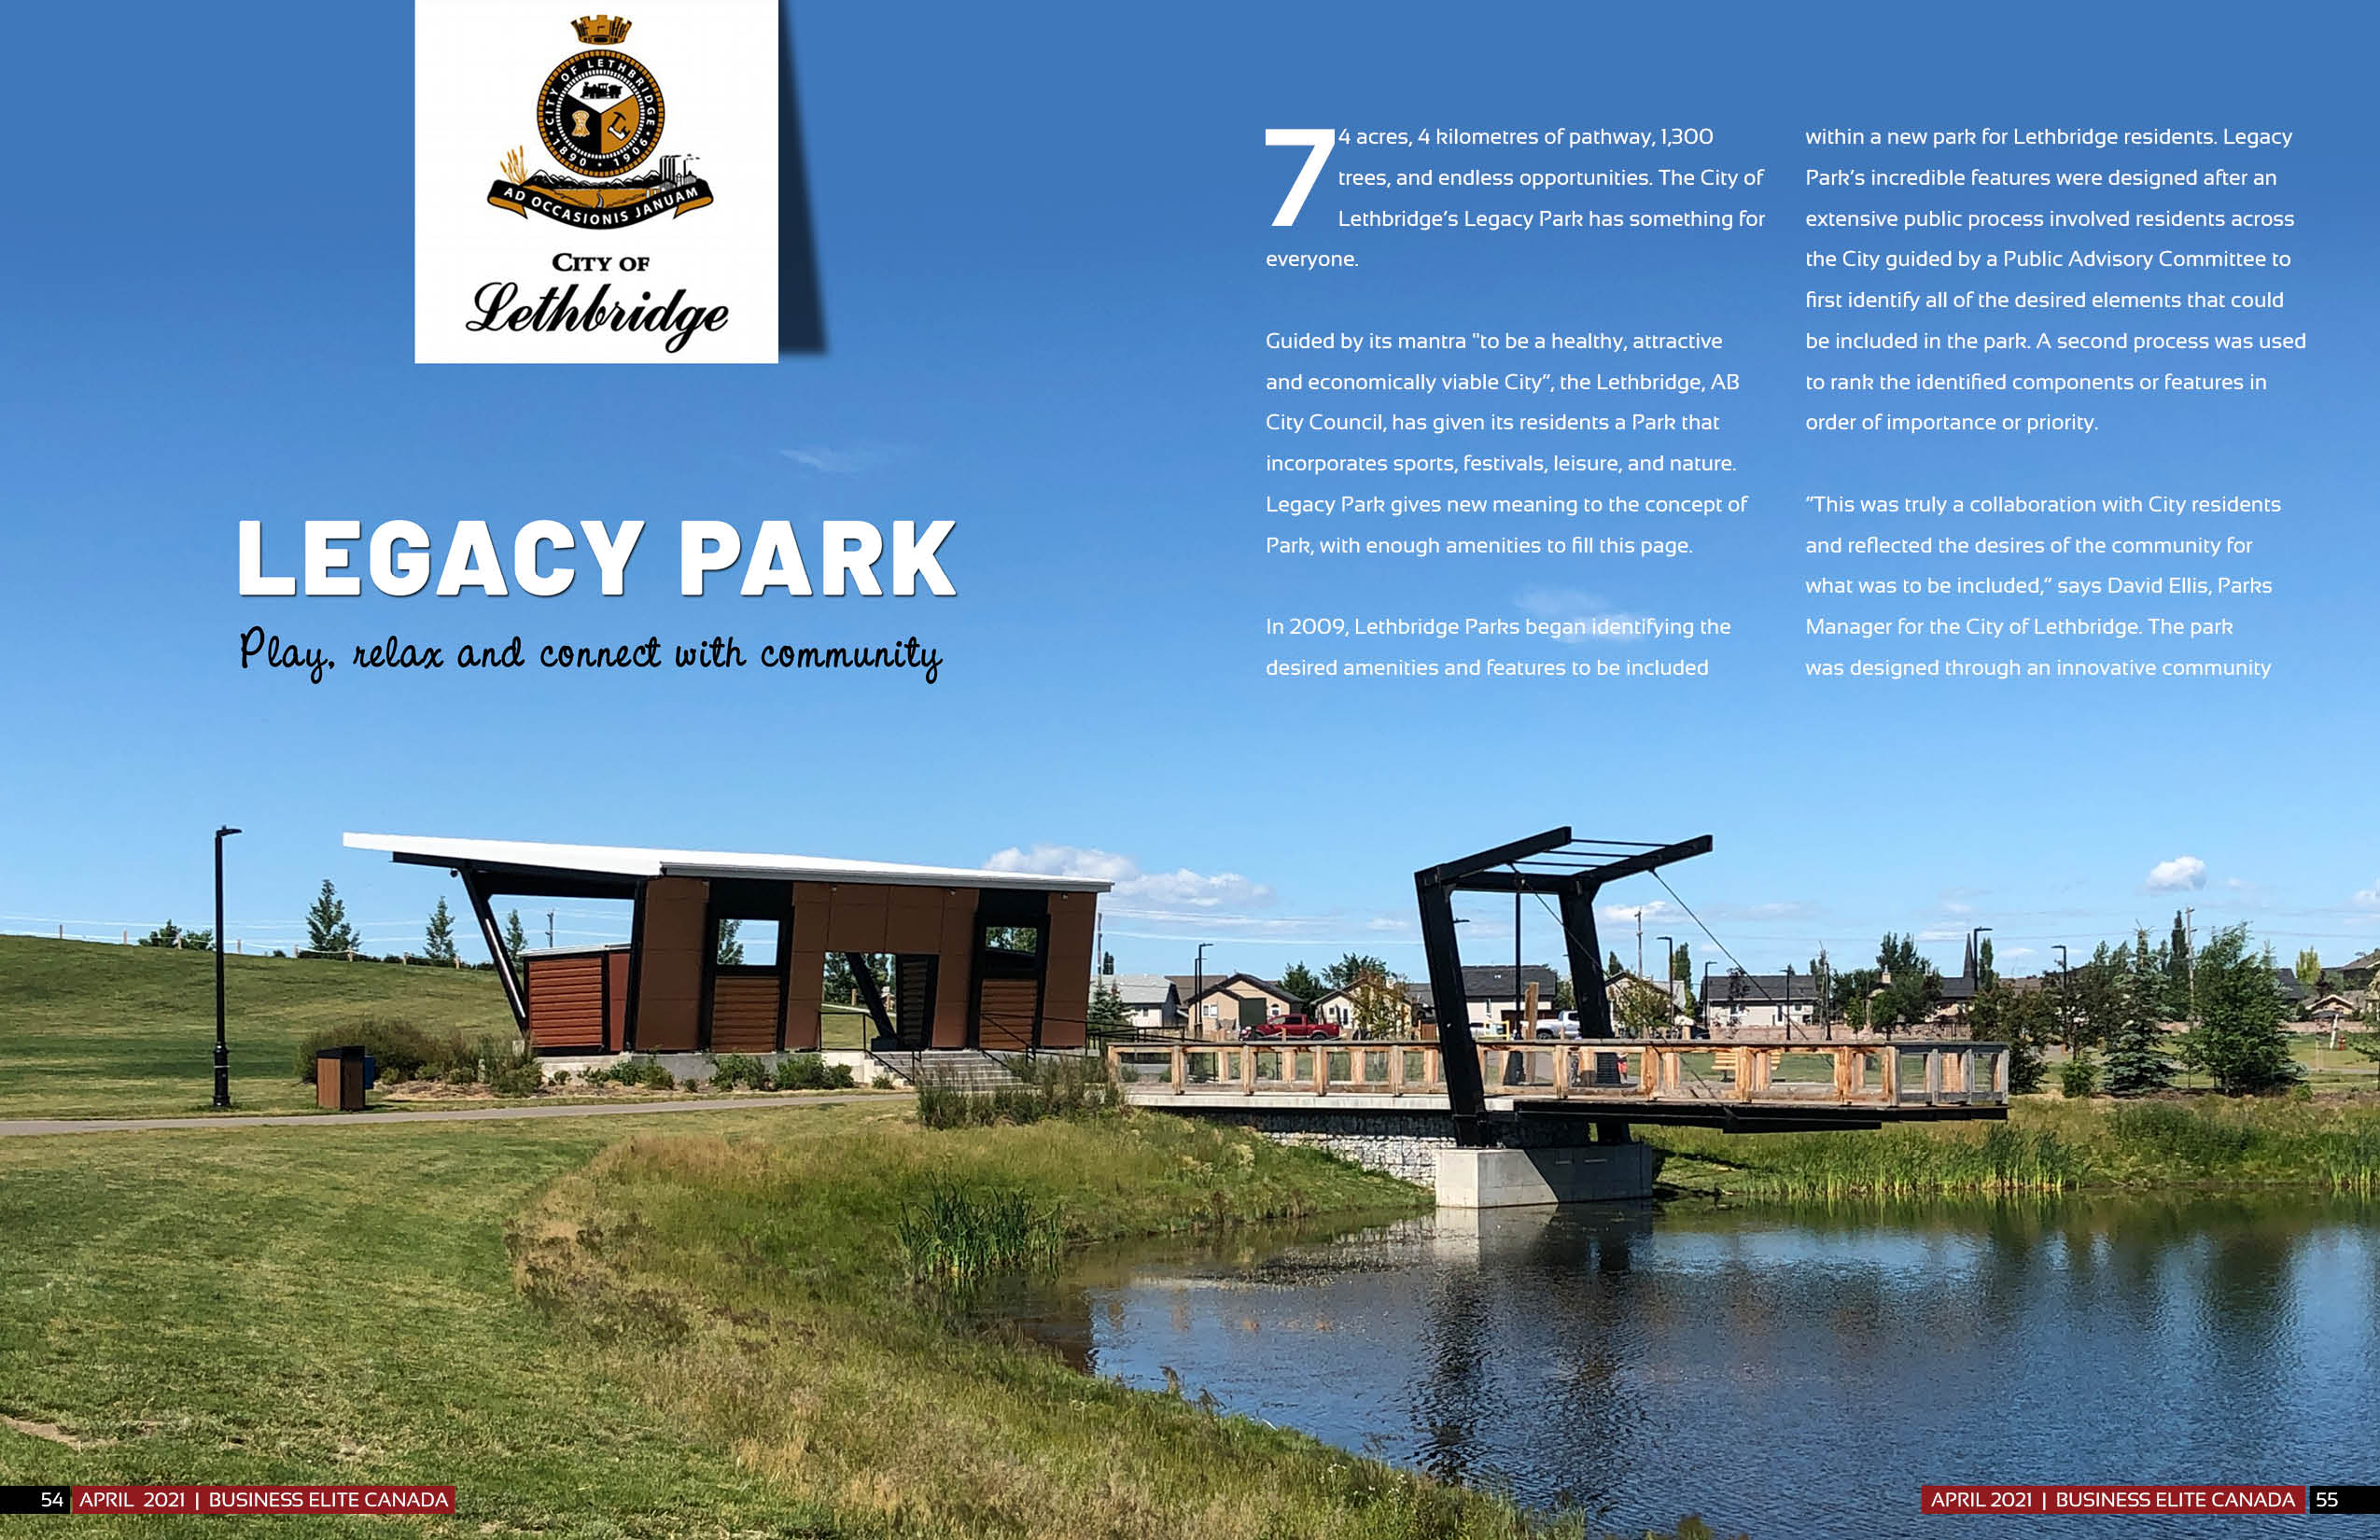 City of Lethbridge - Legacy Park